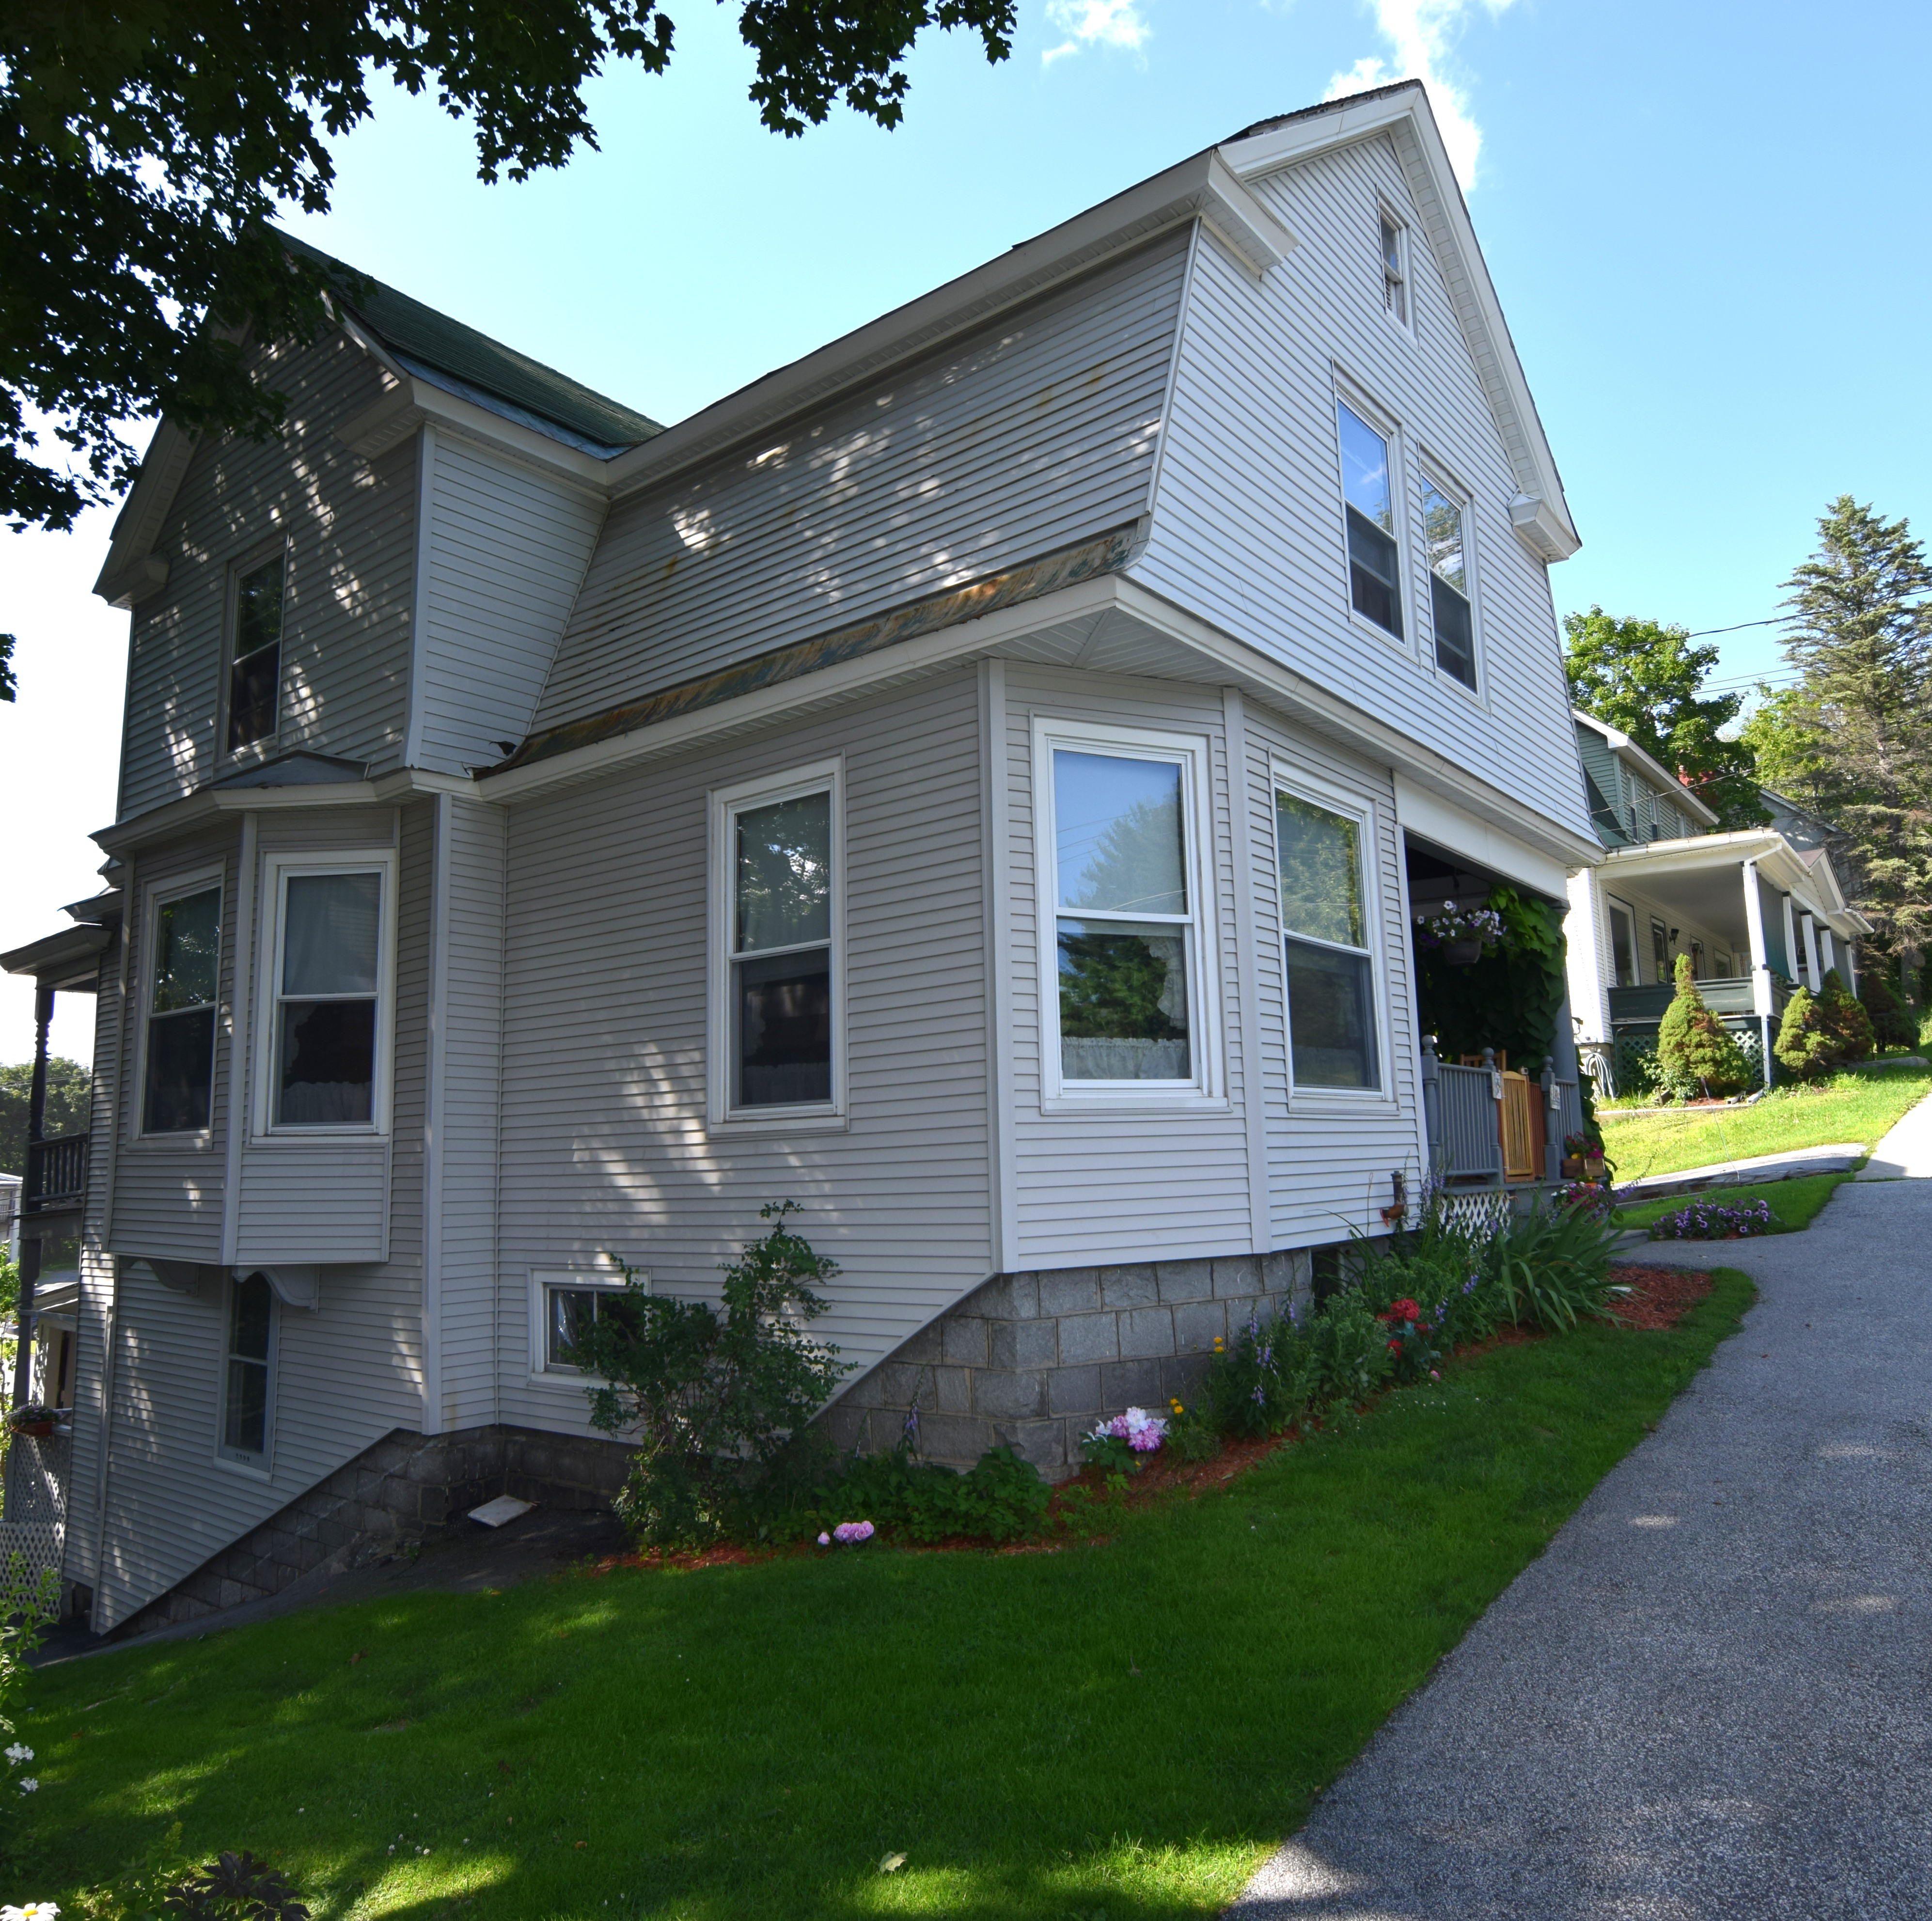 Moradia para Venda às 18 Sheridan Street, Barre City Barre, Vermont 05641 Estados Unidos